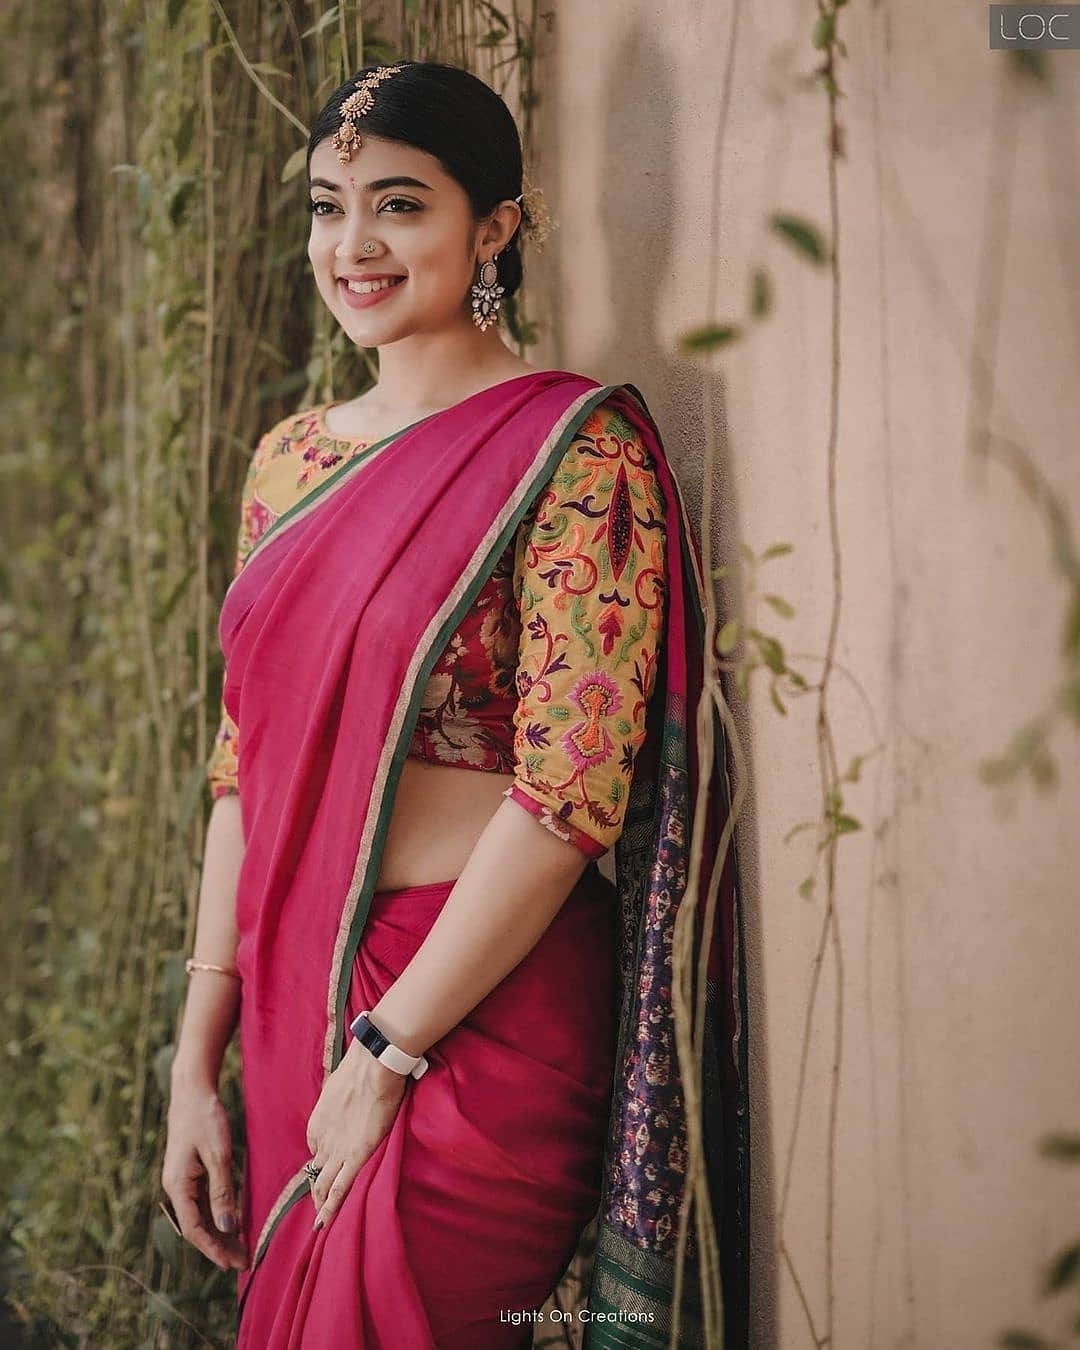 South Indian Actress Madhuri Braganza Looks Hot in Red Saree